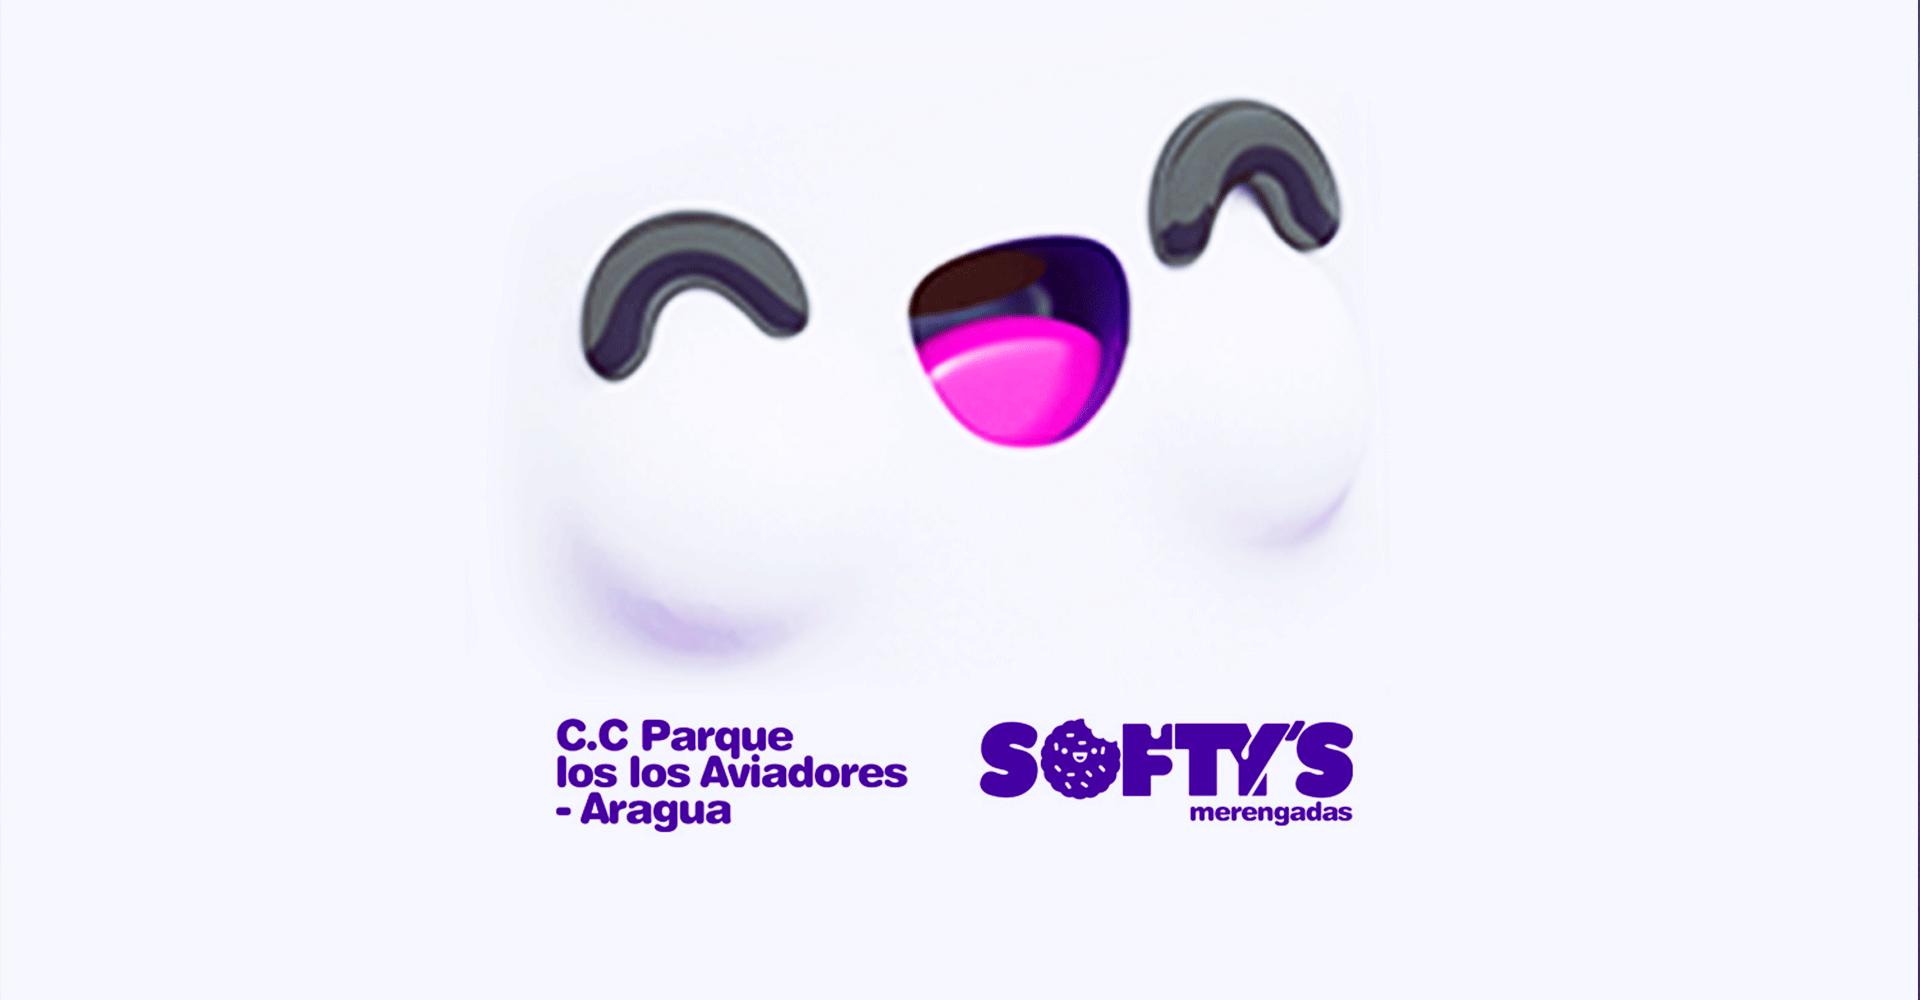 softy-merengadas-chocotoy2.png